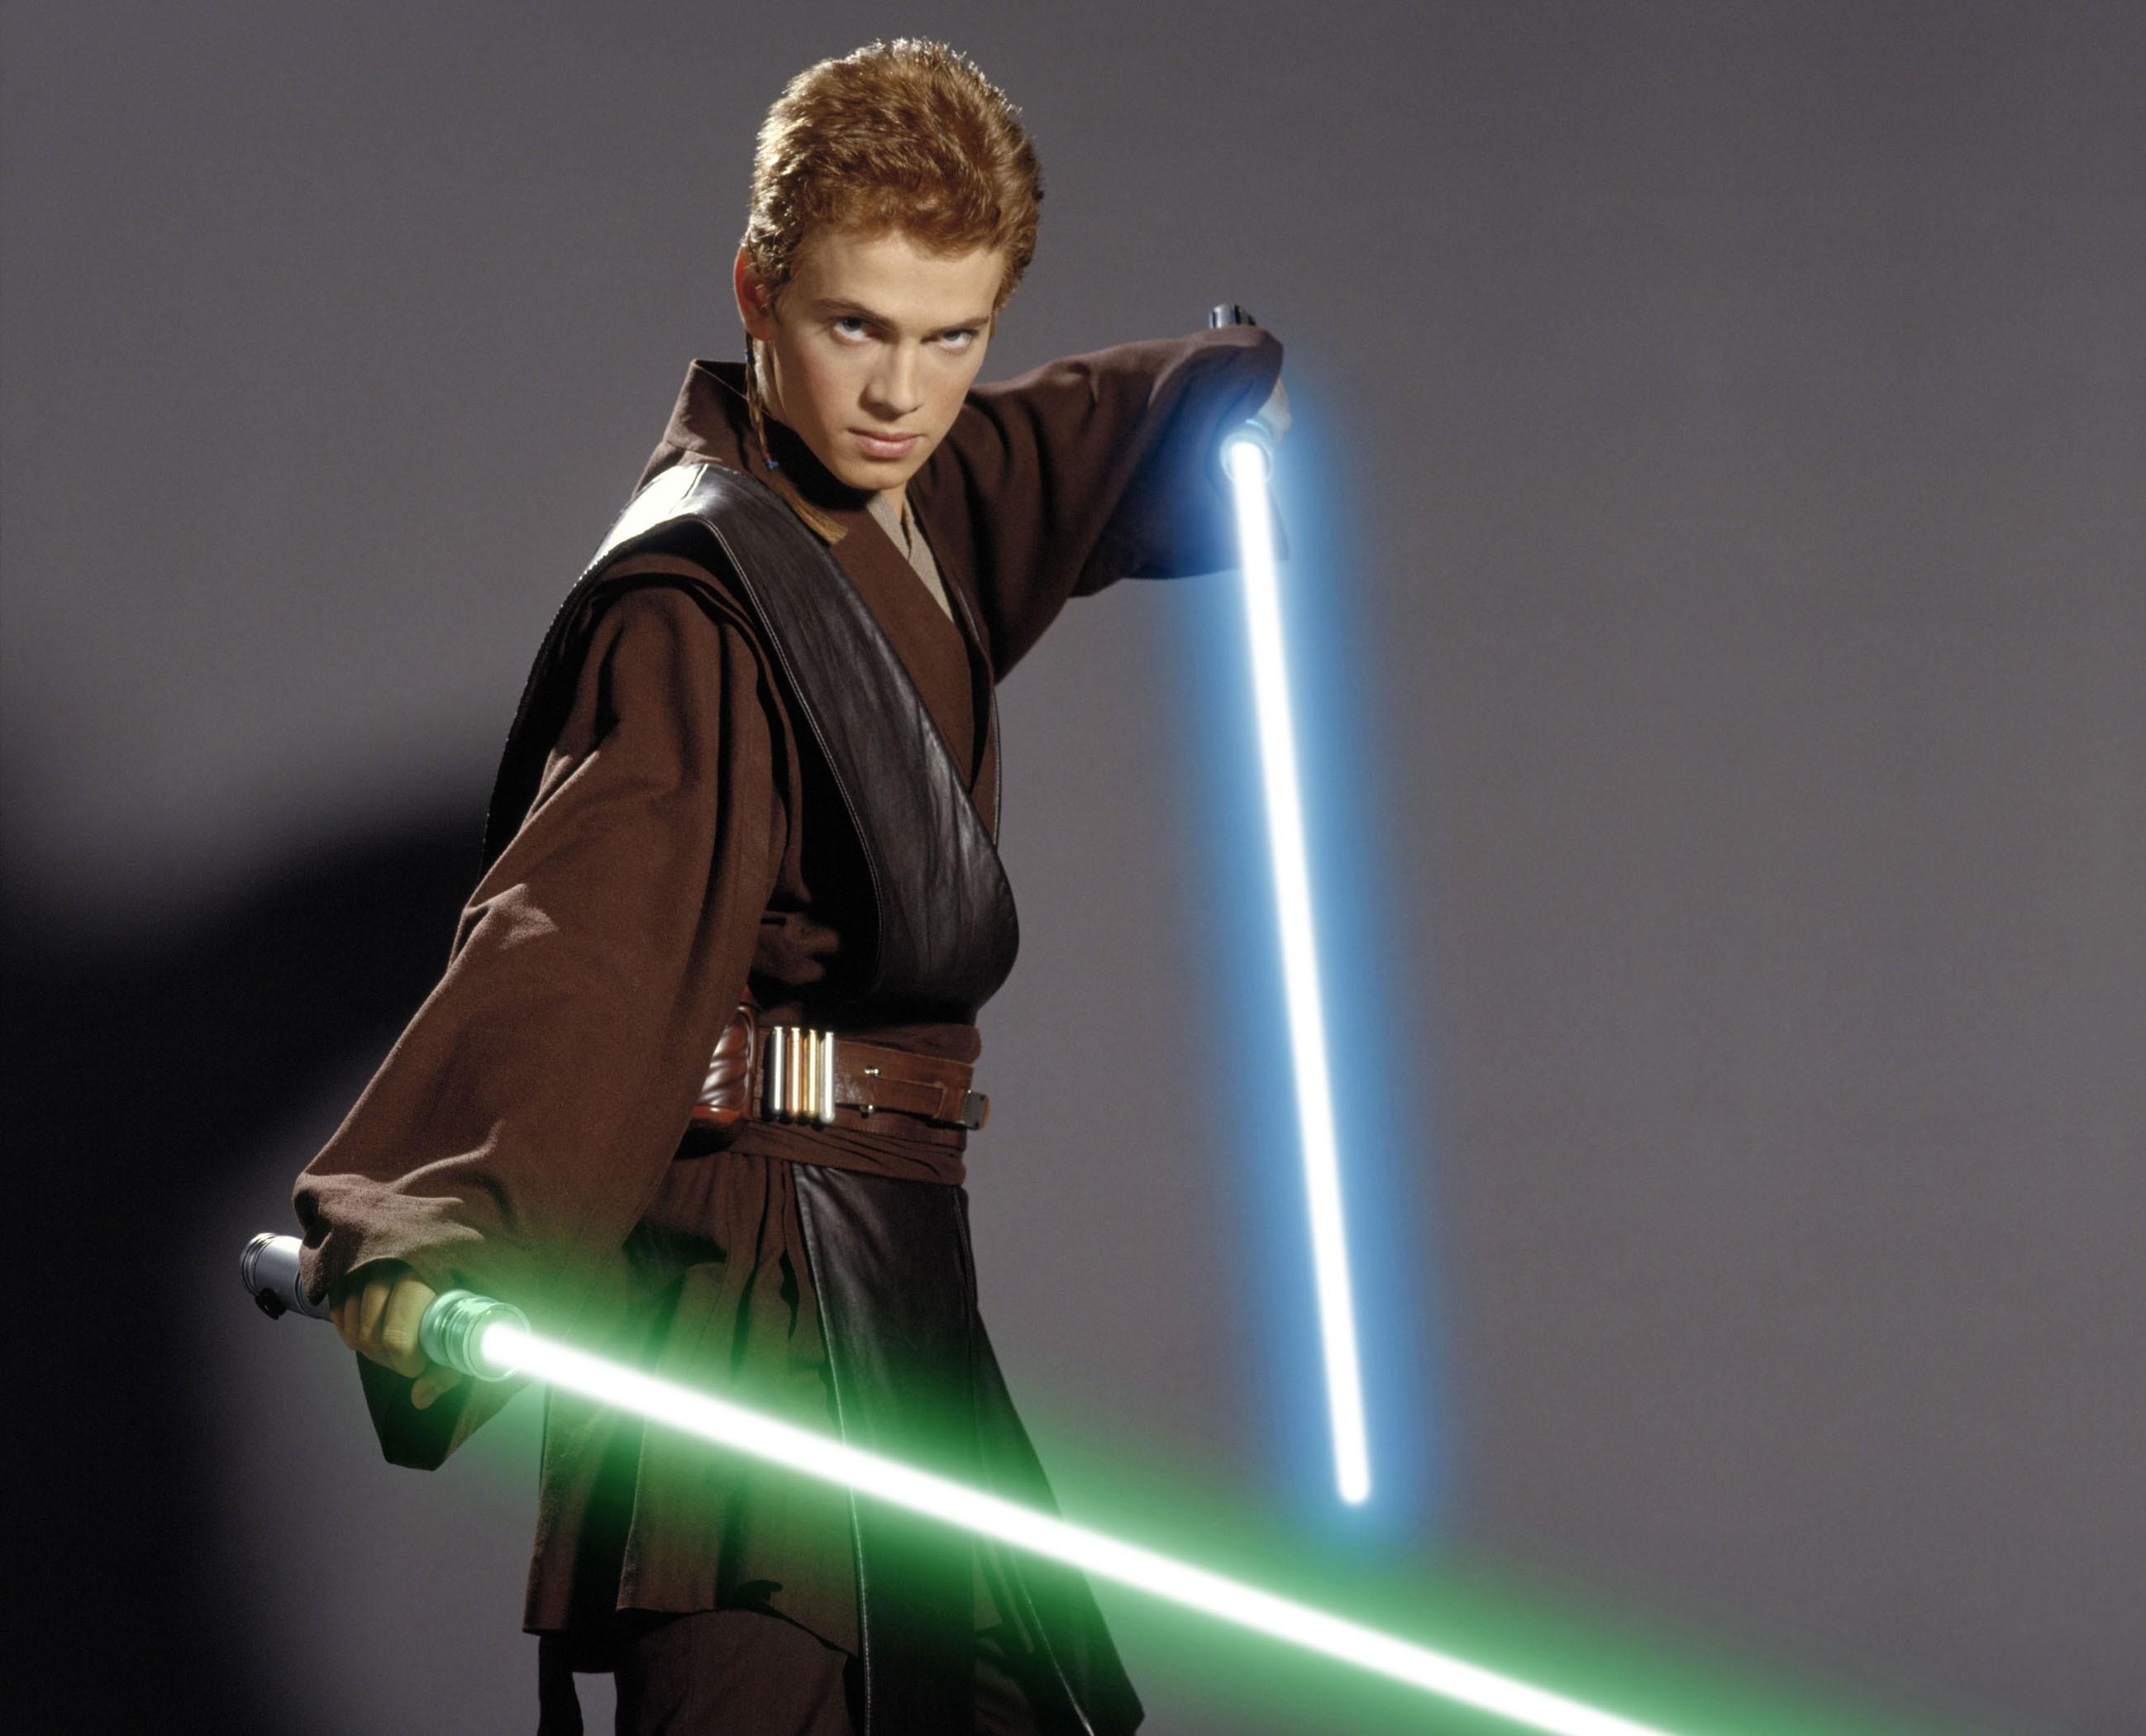 Image - Anakin2sabers.jpg - Wookieepedia, the Star Wars Wiki